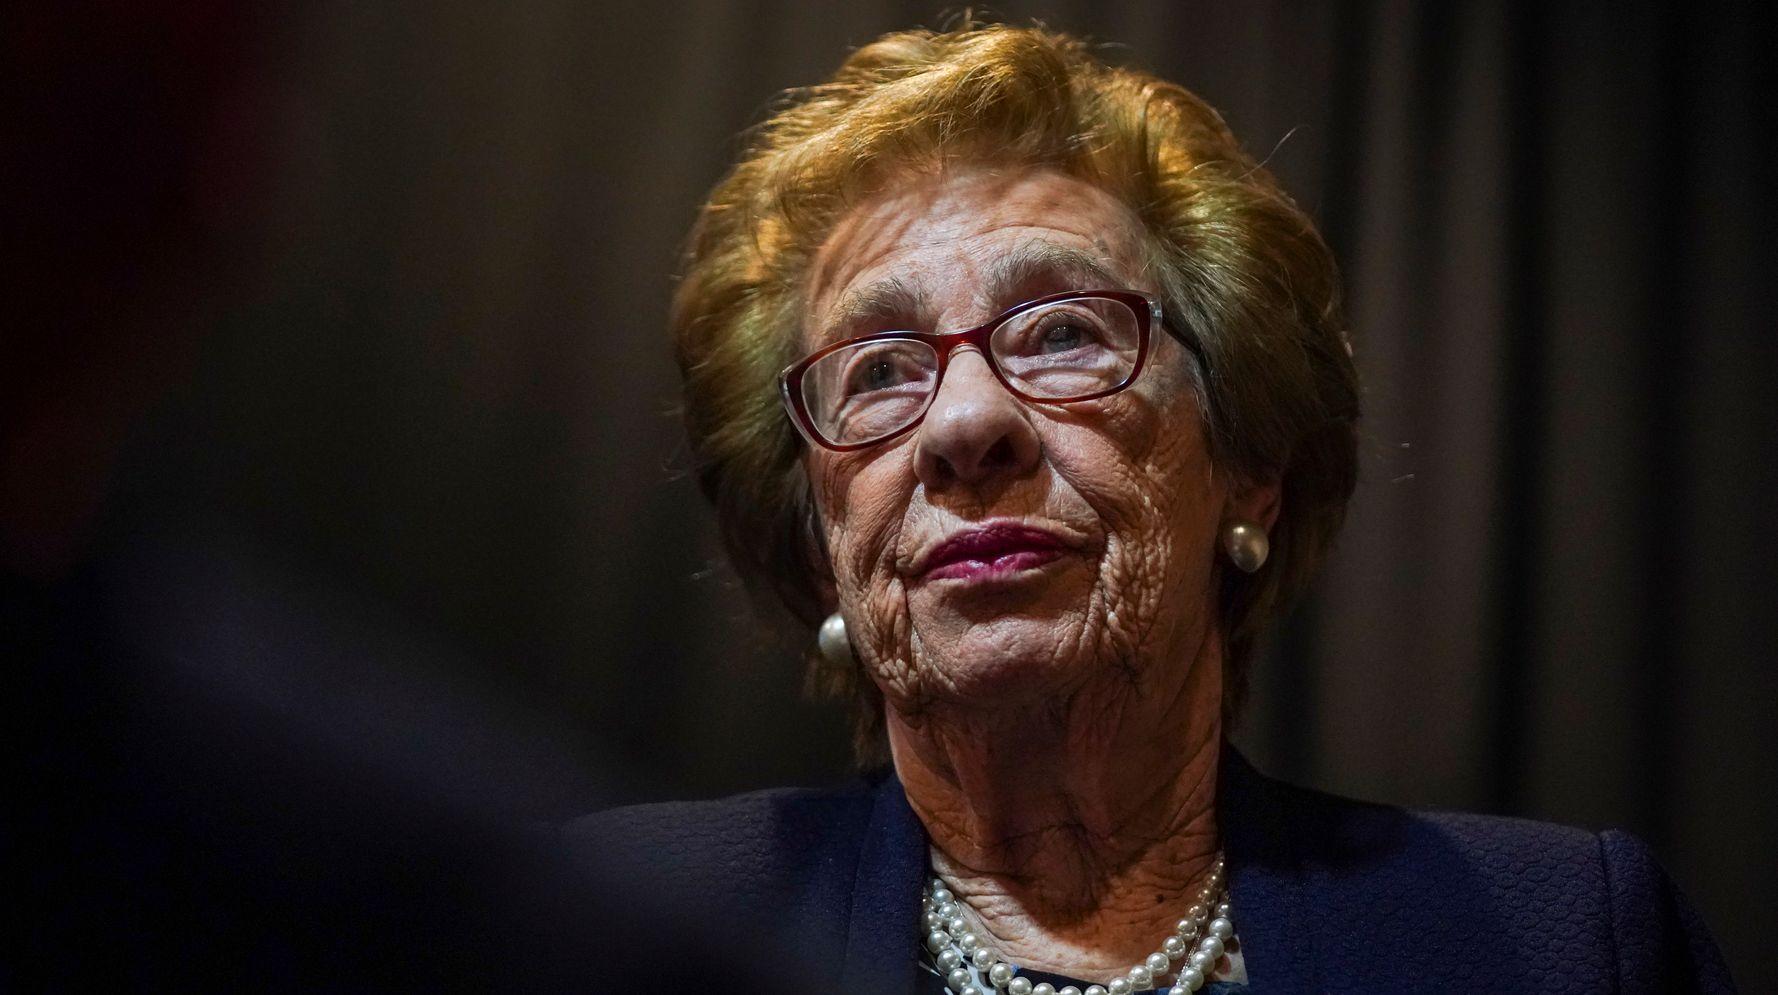 Anne Frank's Stepsister Eva Schloss Says Trump Reminded Her Of Hitler